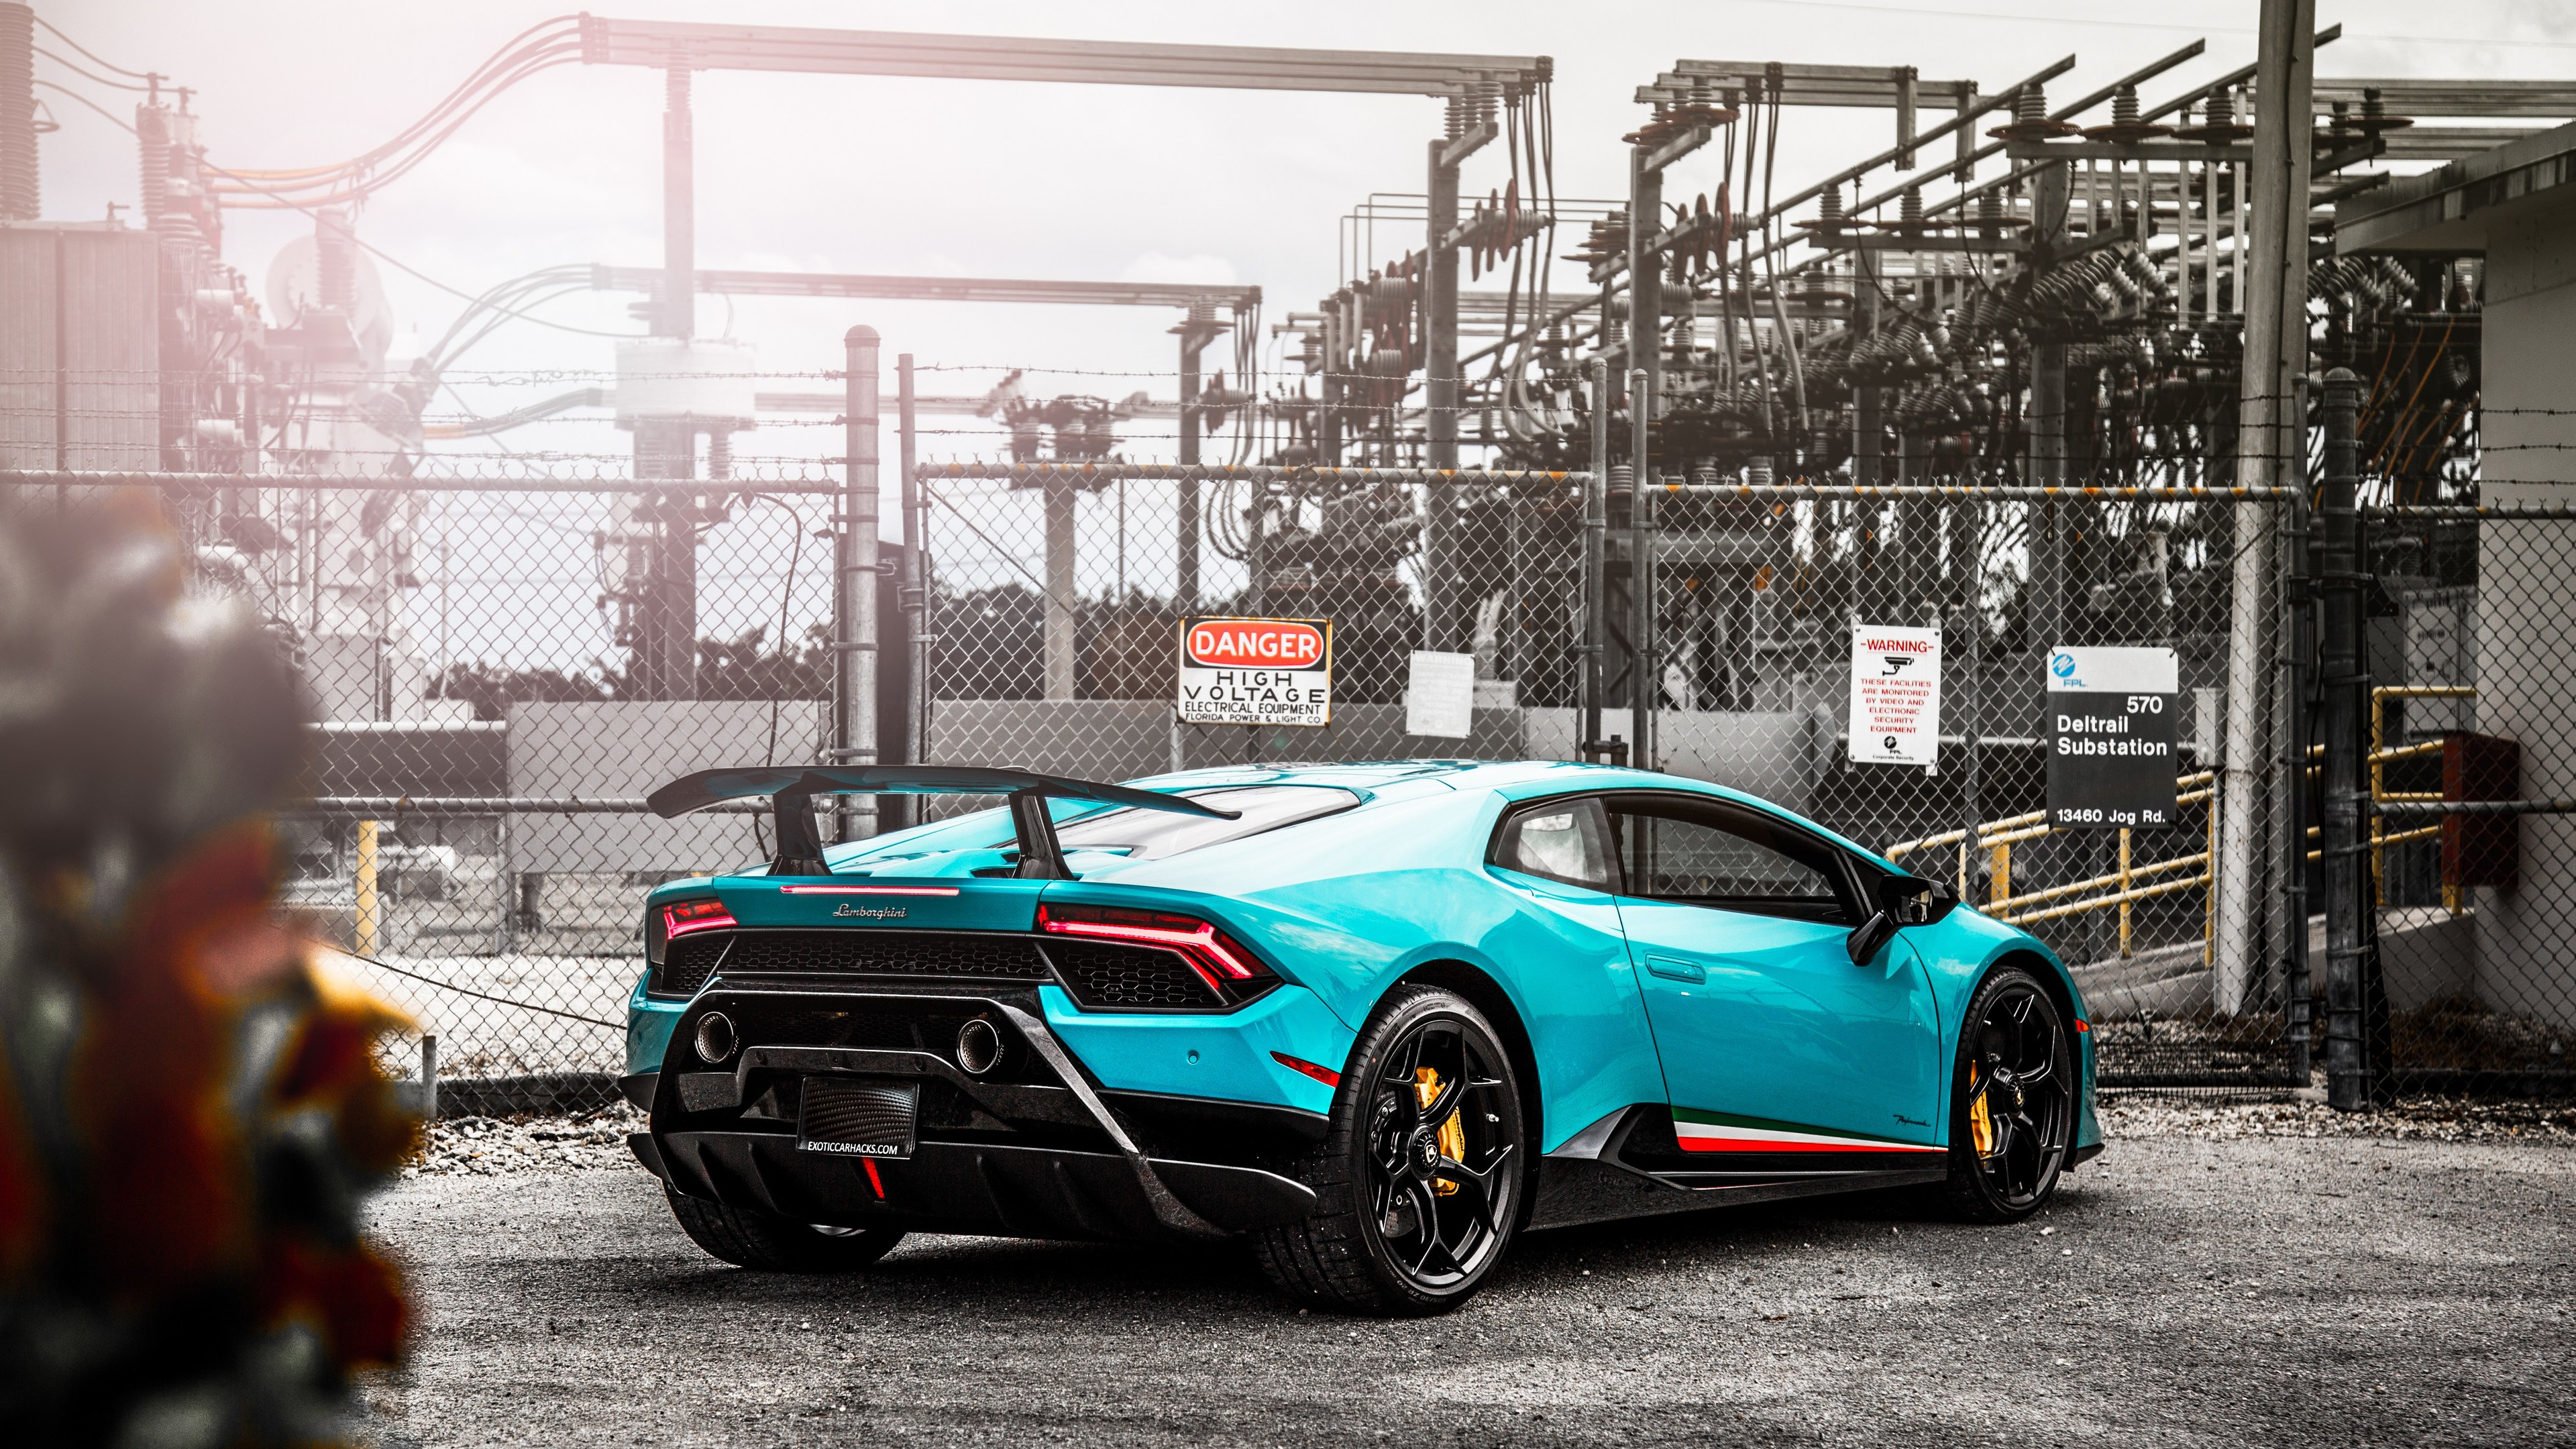 Wallpaper 4k Lamborghini Huracan Performante Rear 5k 2018 Cars